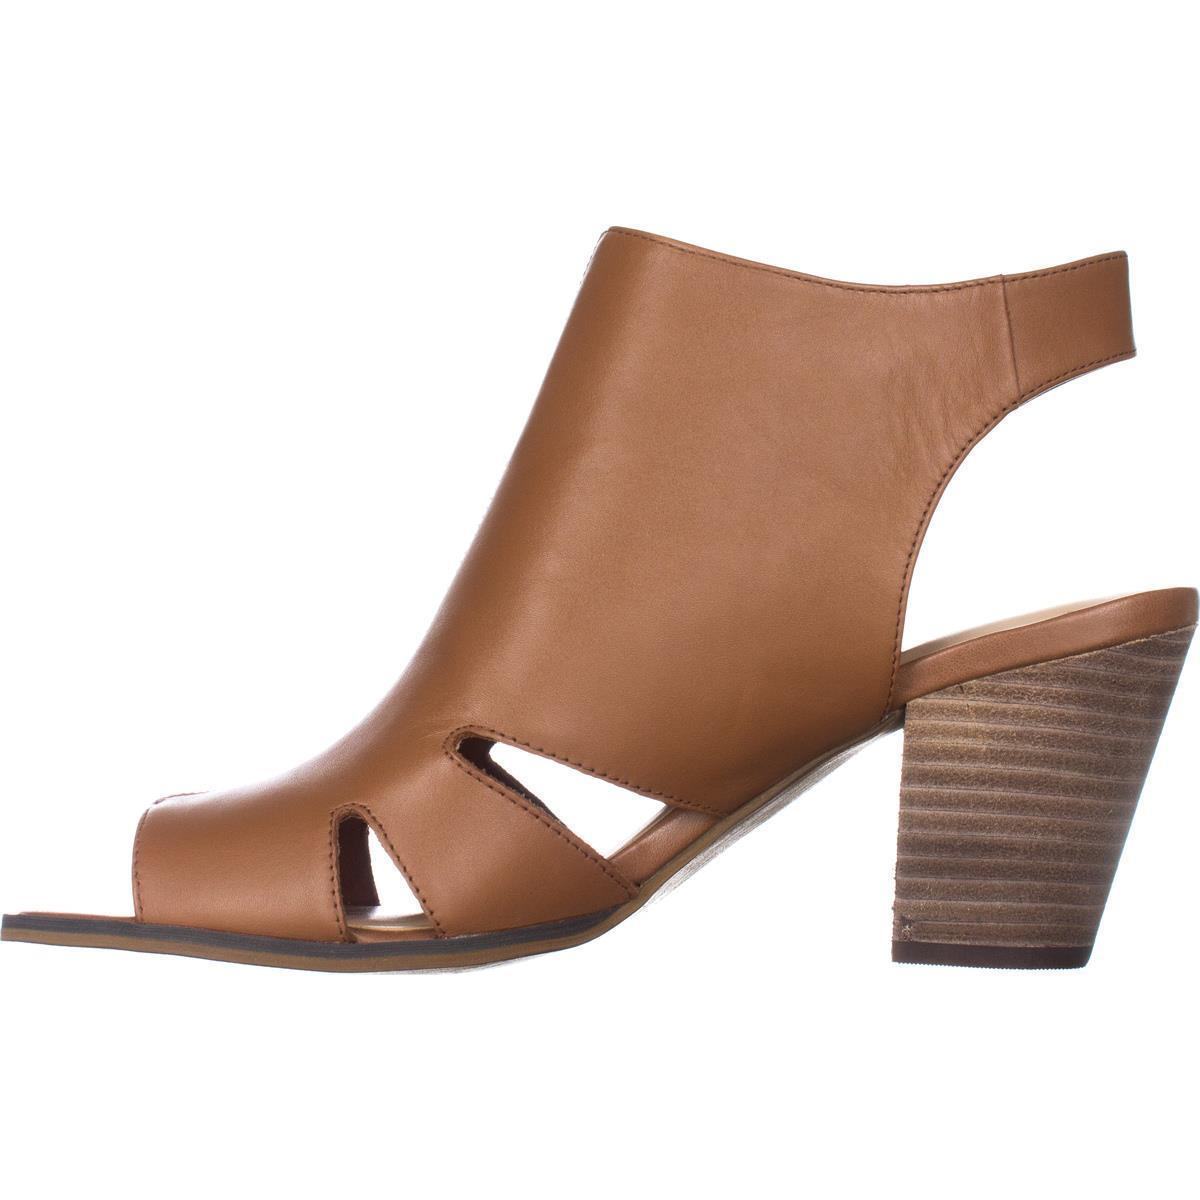 Womens Bella Vita Kimmy Peep Toe Heeled Zip Cut Out Sandals, Biscuit